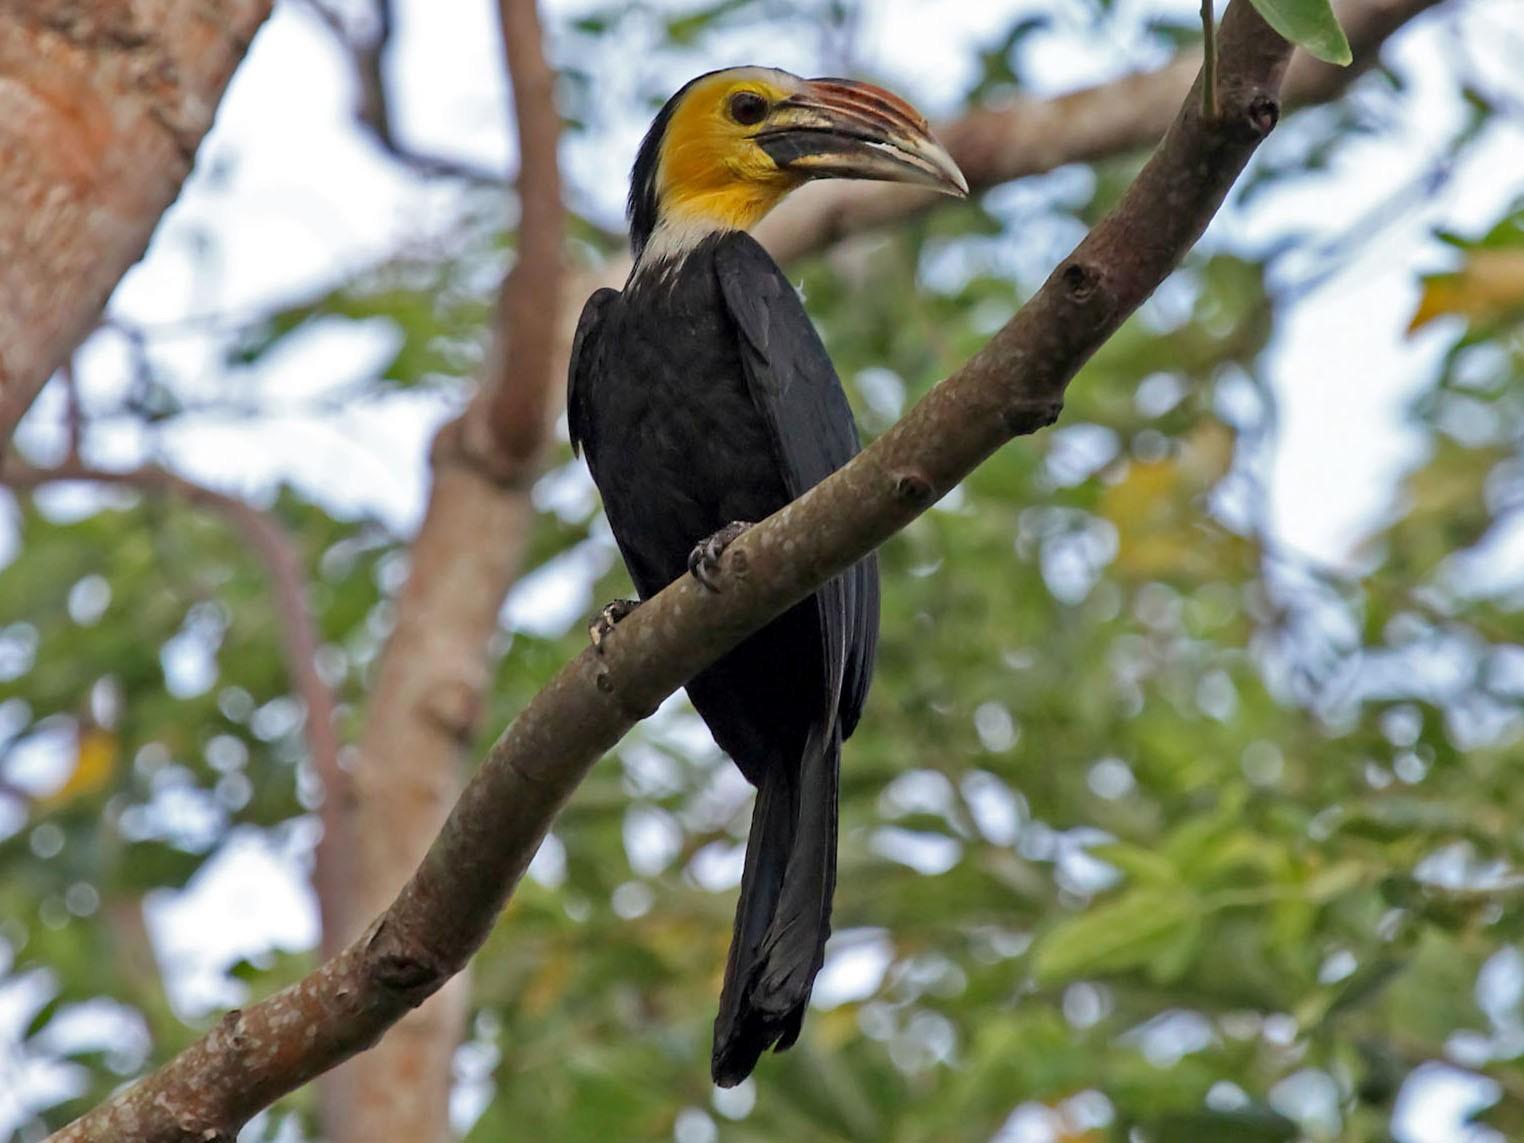 Sulawesi Hornbill - Phillip Edwards